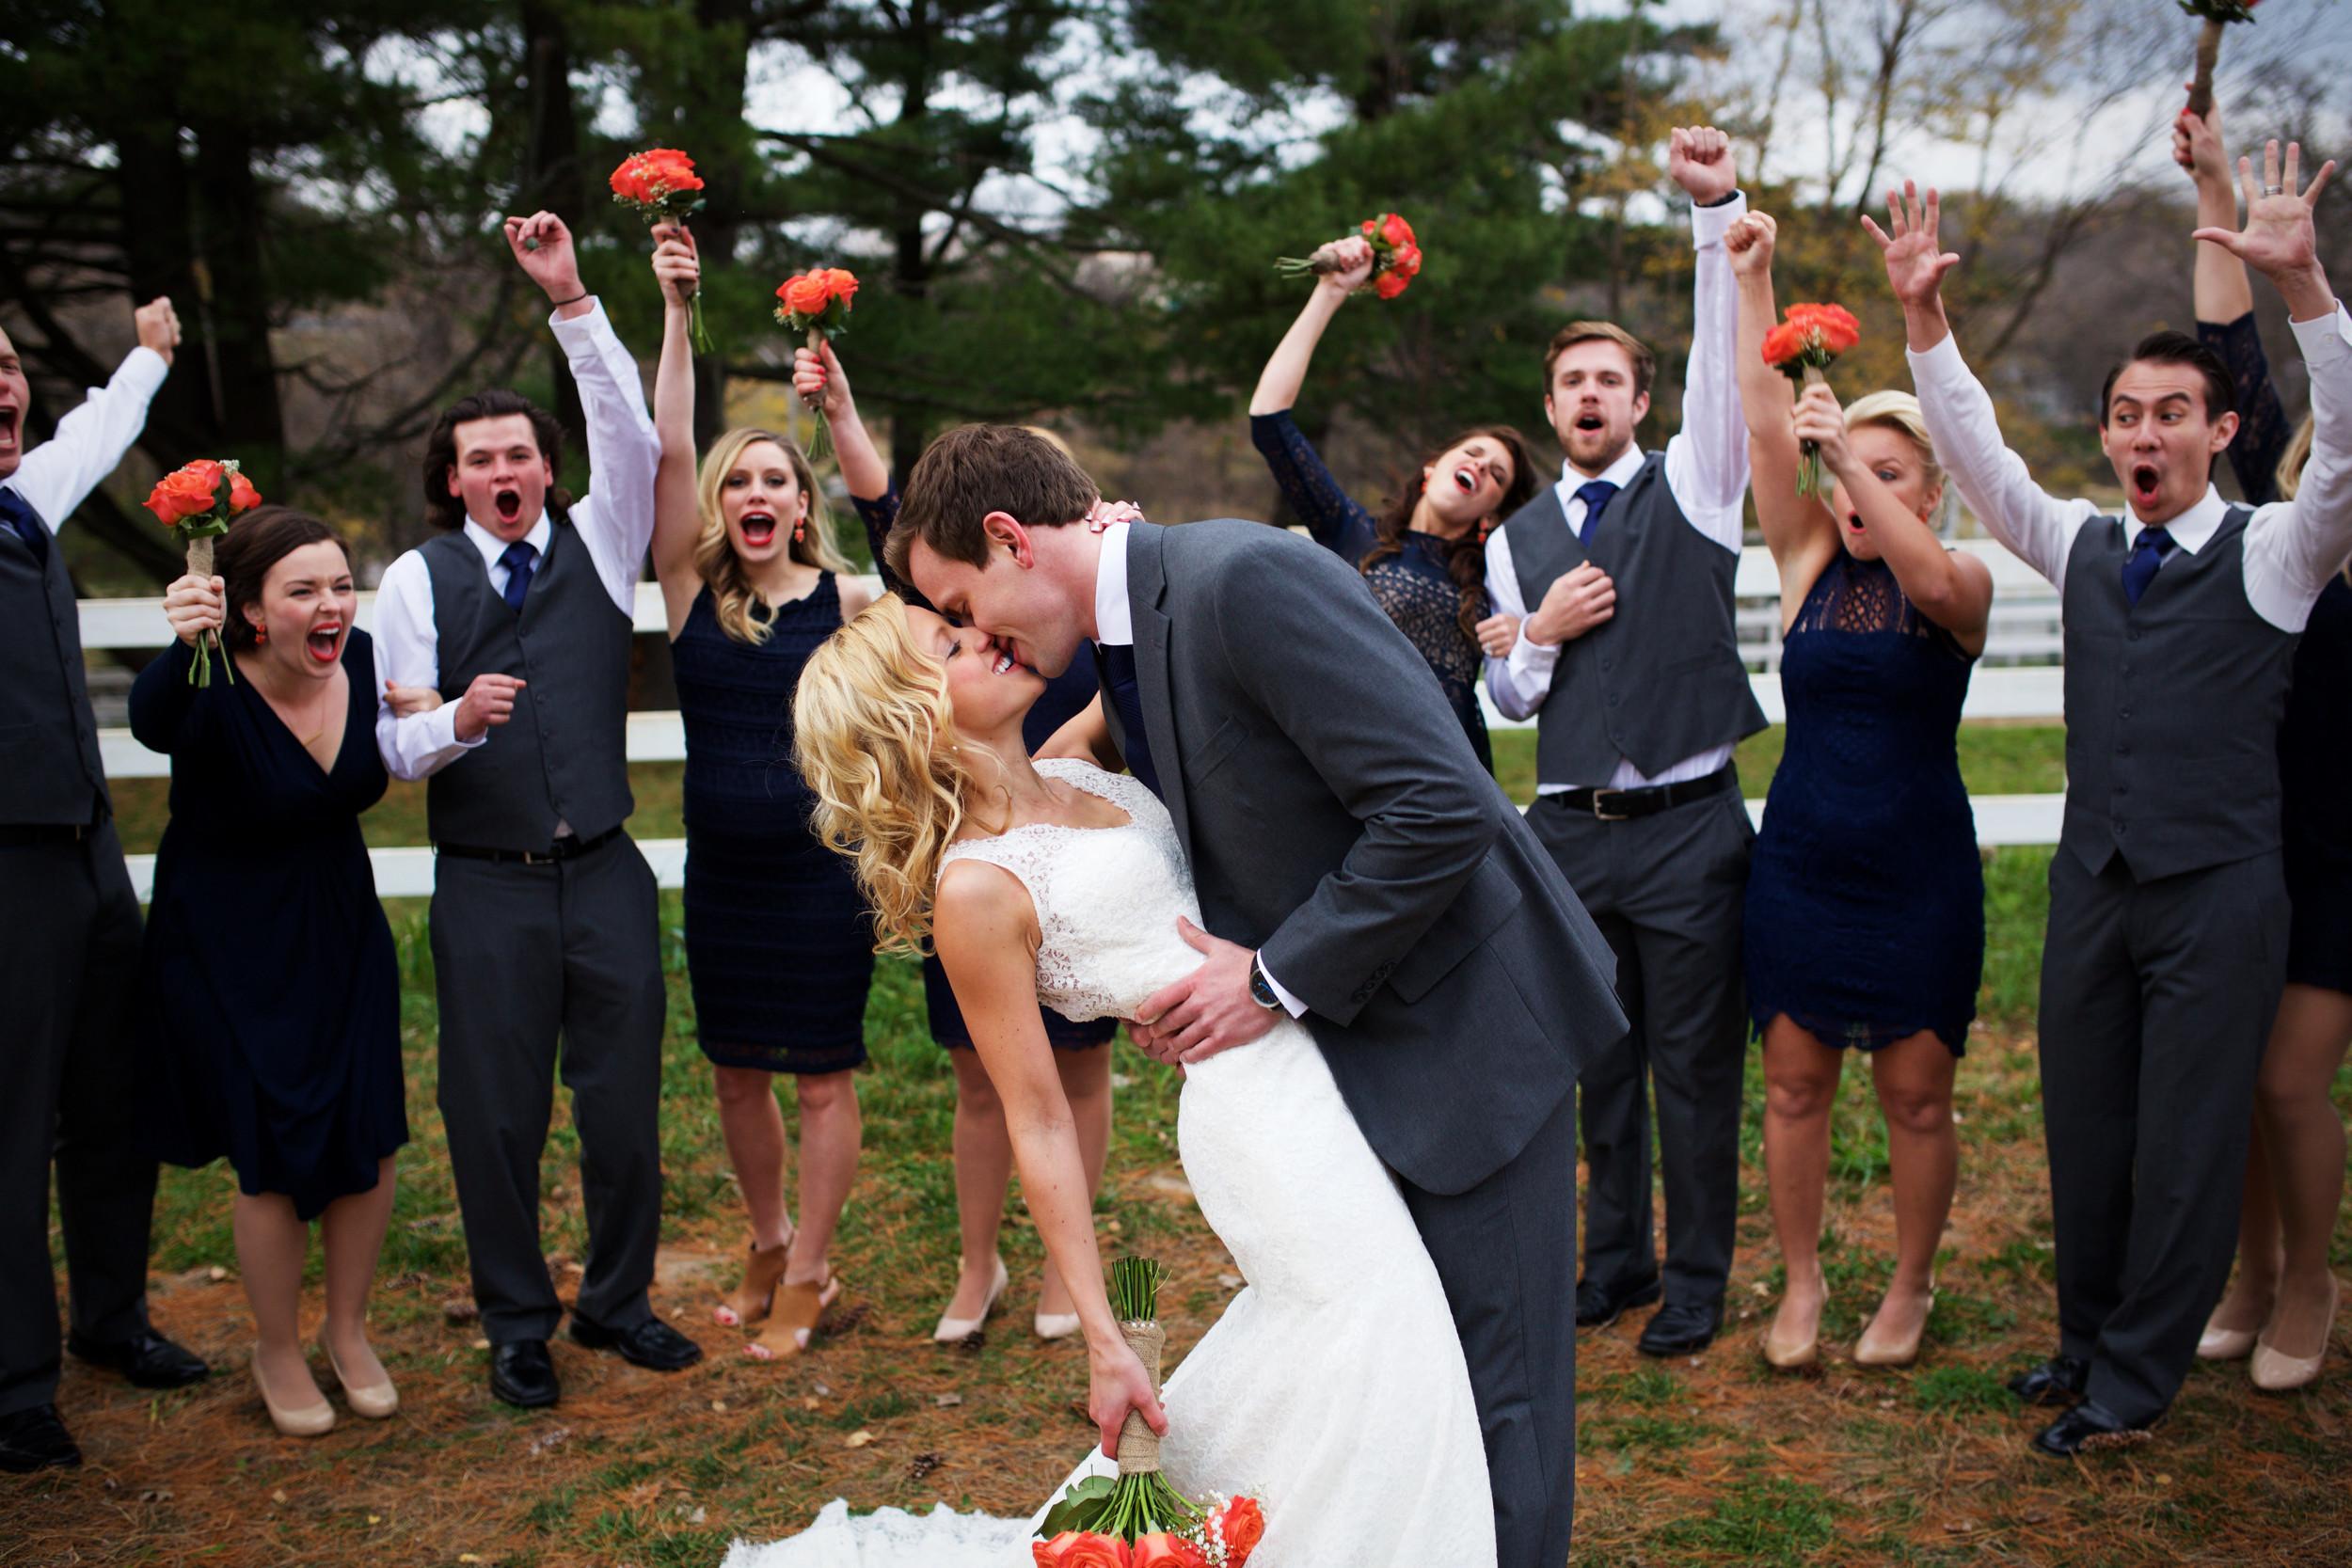 OneOne November wedding 039.jpg